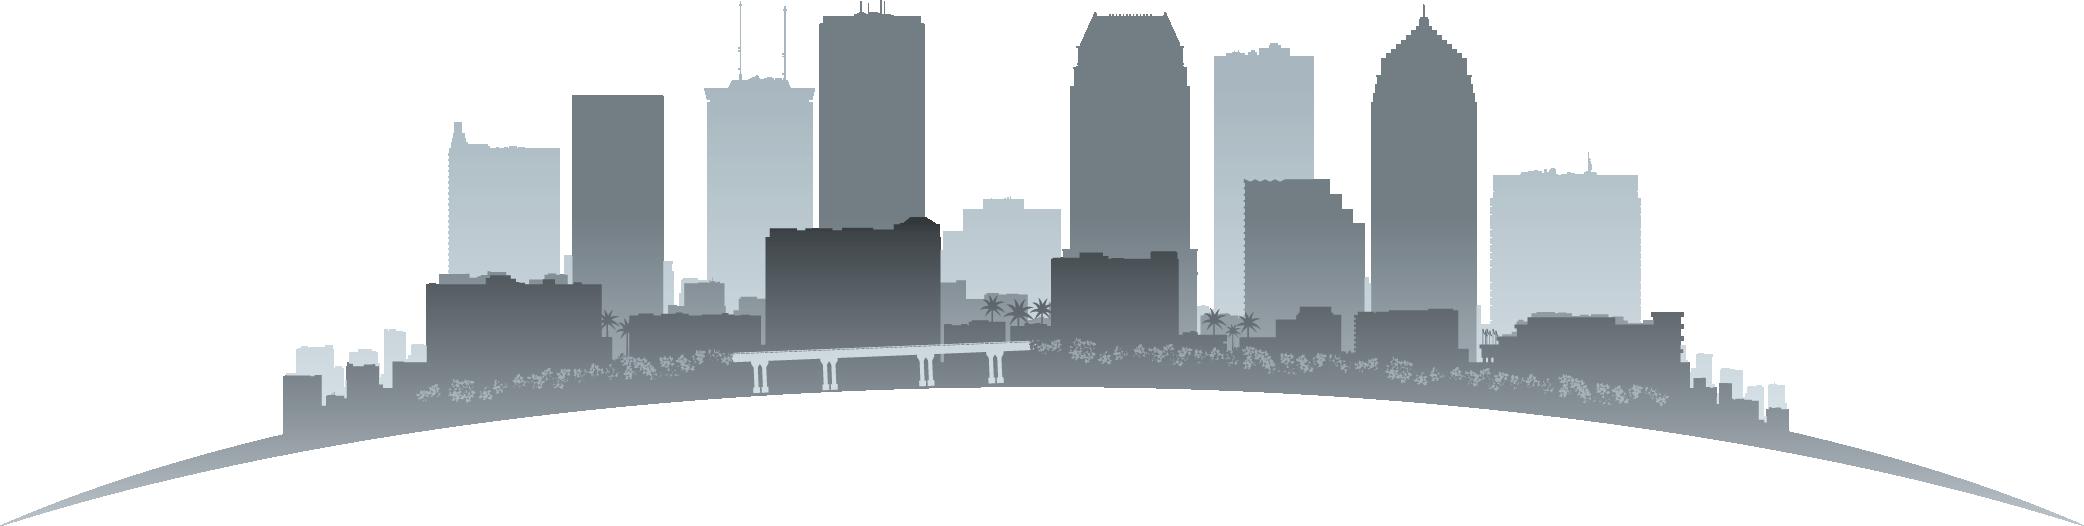 Test America - Tampa, Florida